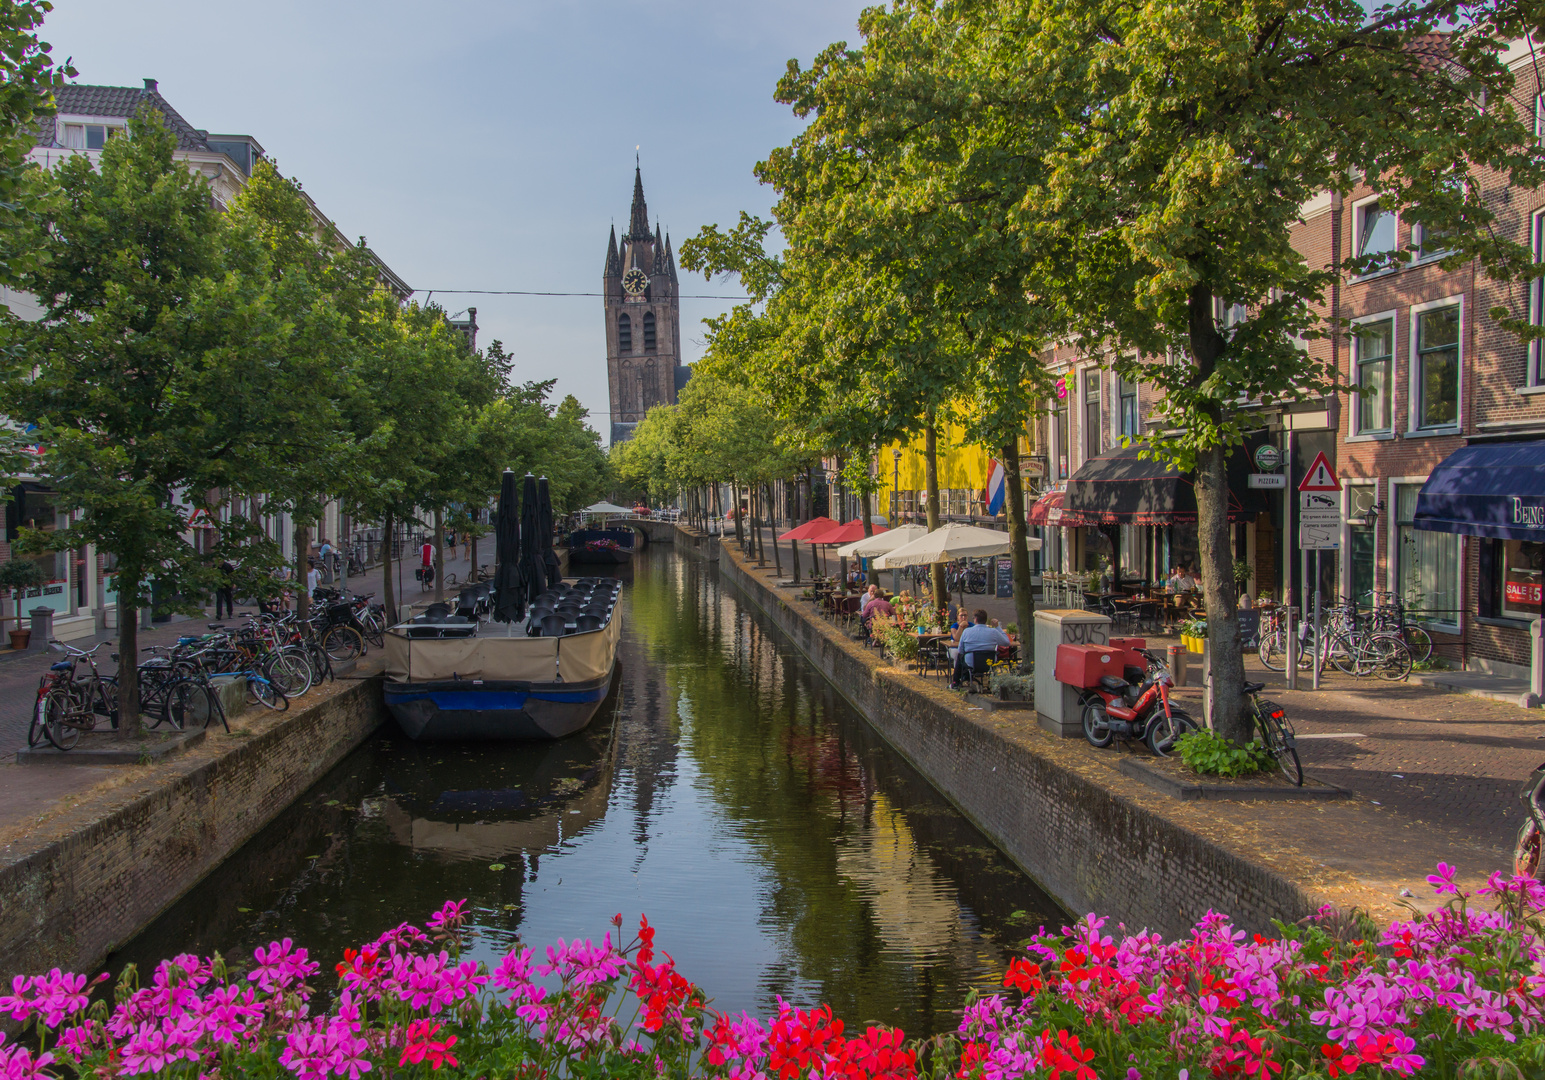 schiefer Turm - Delft/Niederlande